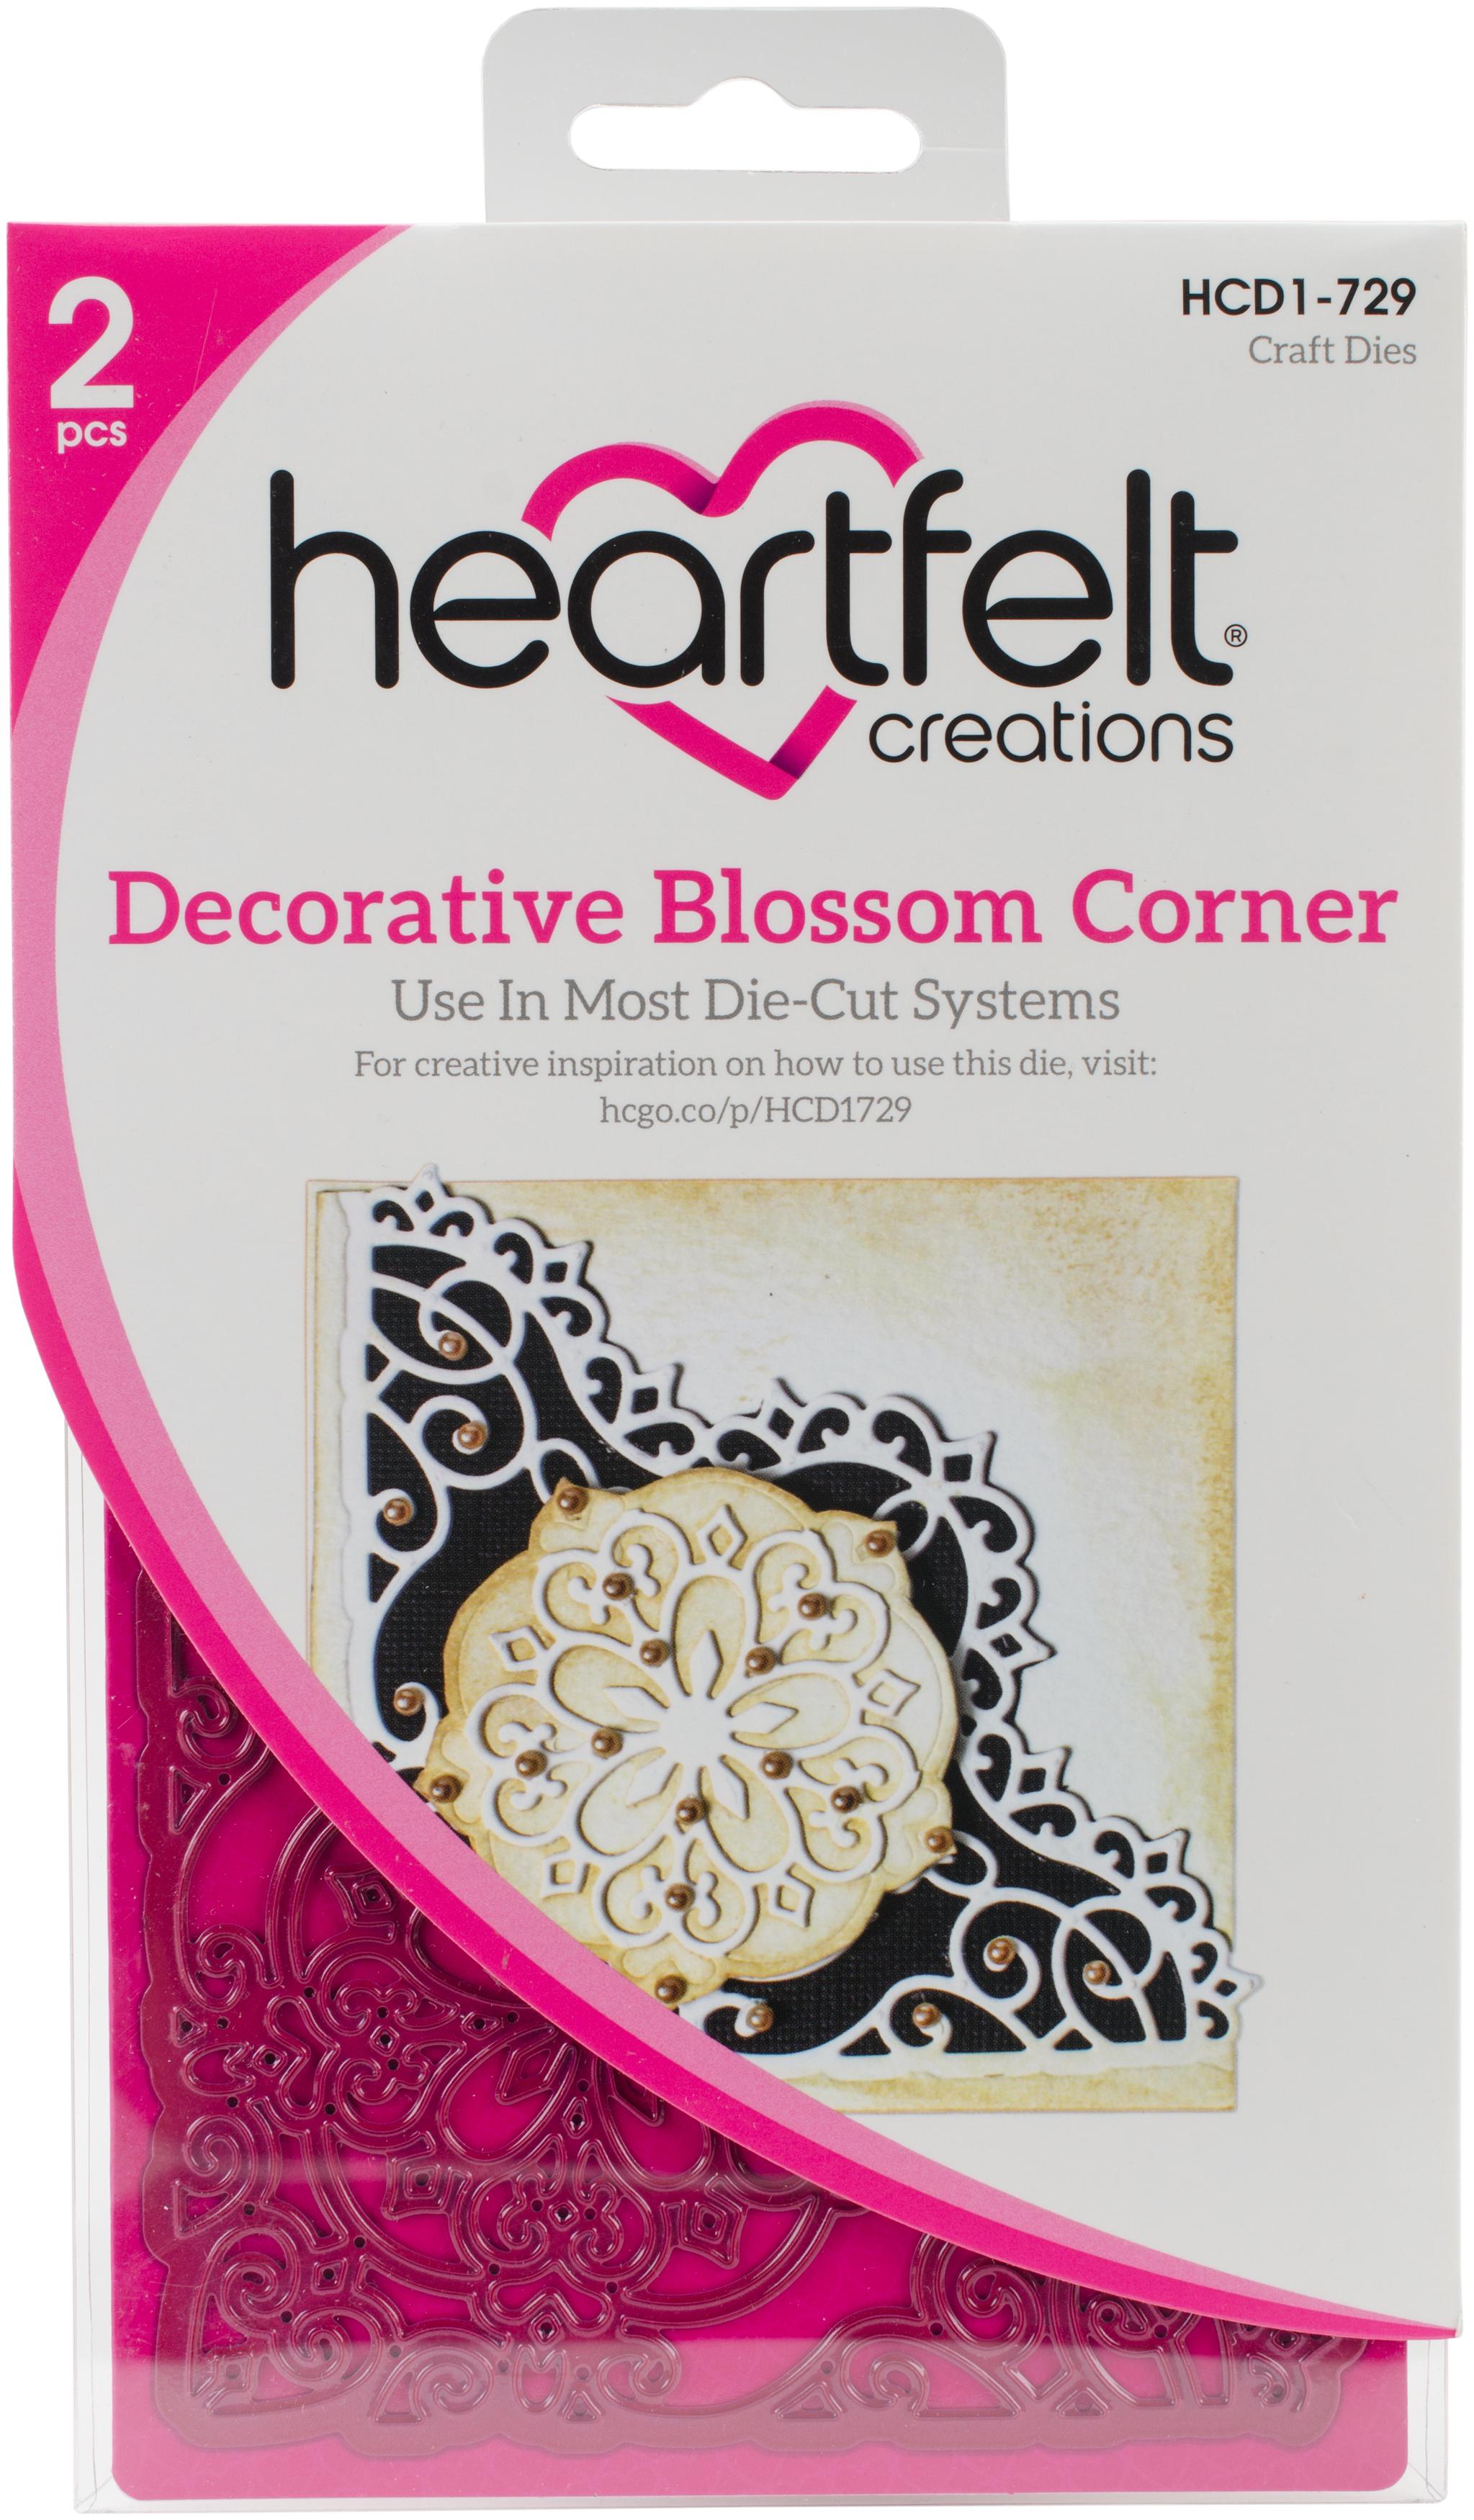 Heartfelt Creations Decorative Blosson Corner Die